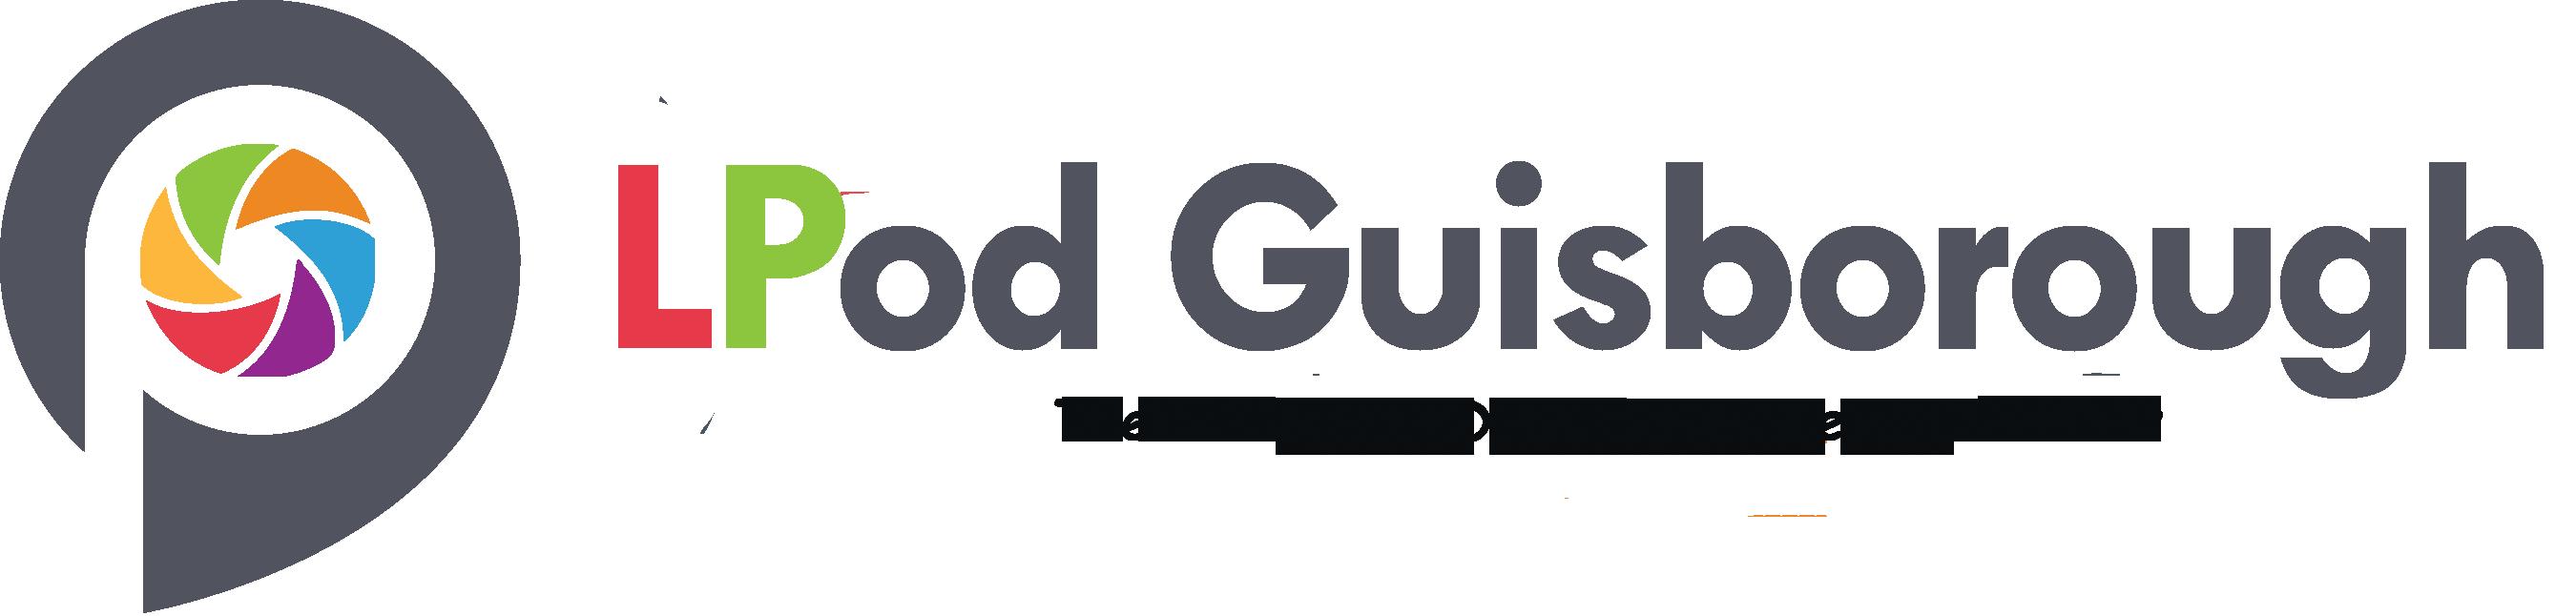 intensive driving courses Guisborough